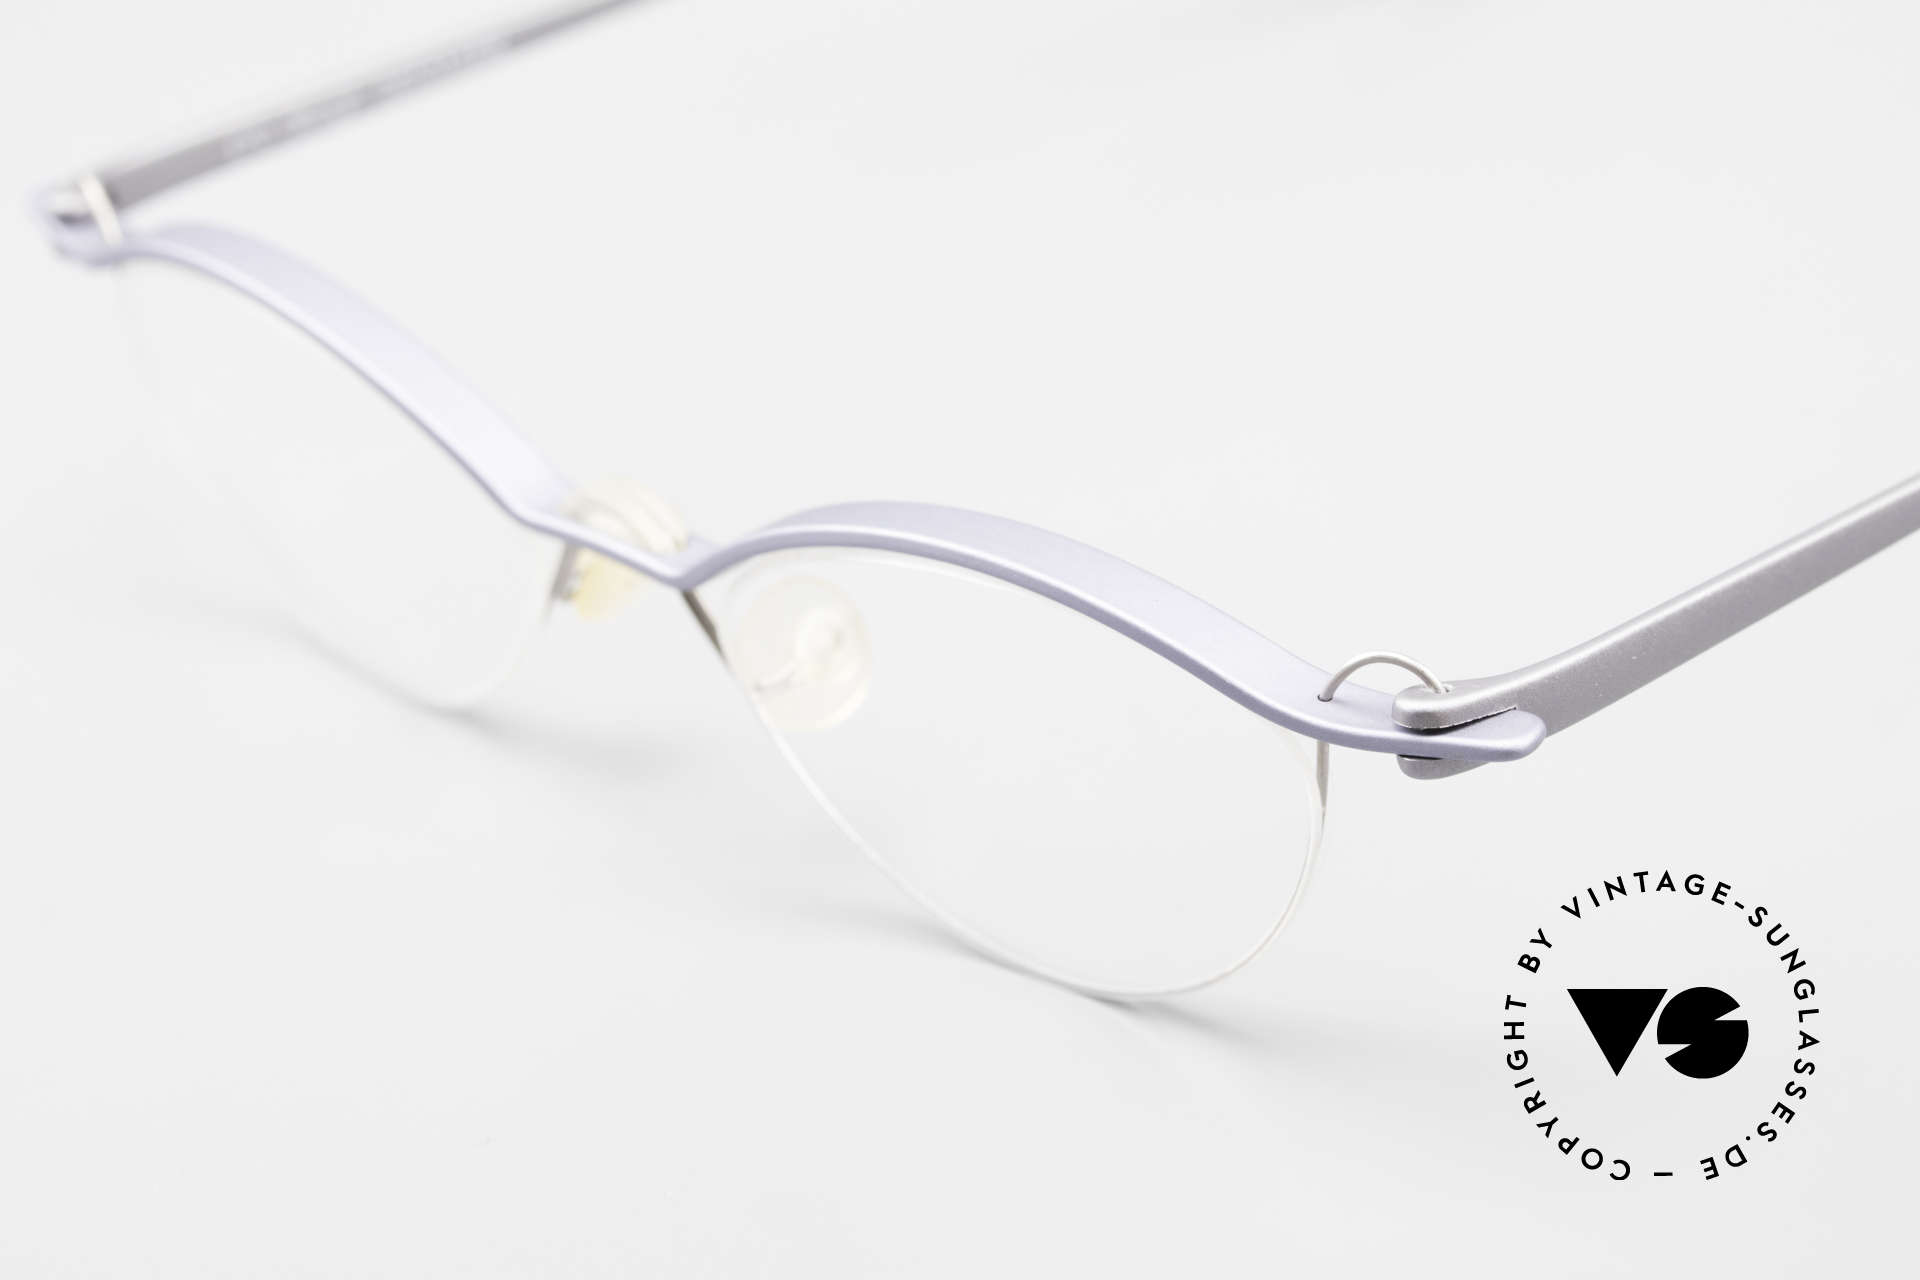 ProDesign No26 Aluminium Gail Spence Frame, distinctively GAIL SPENCE (specs for design lovers), Made for Men and Women